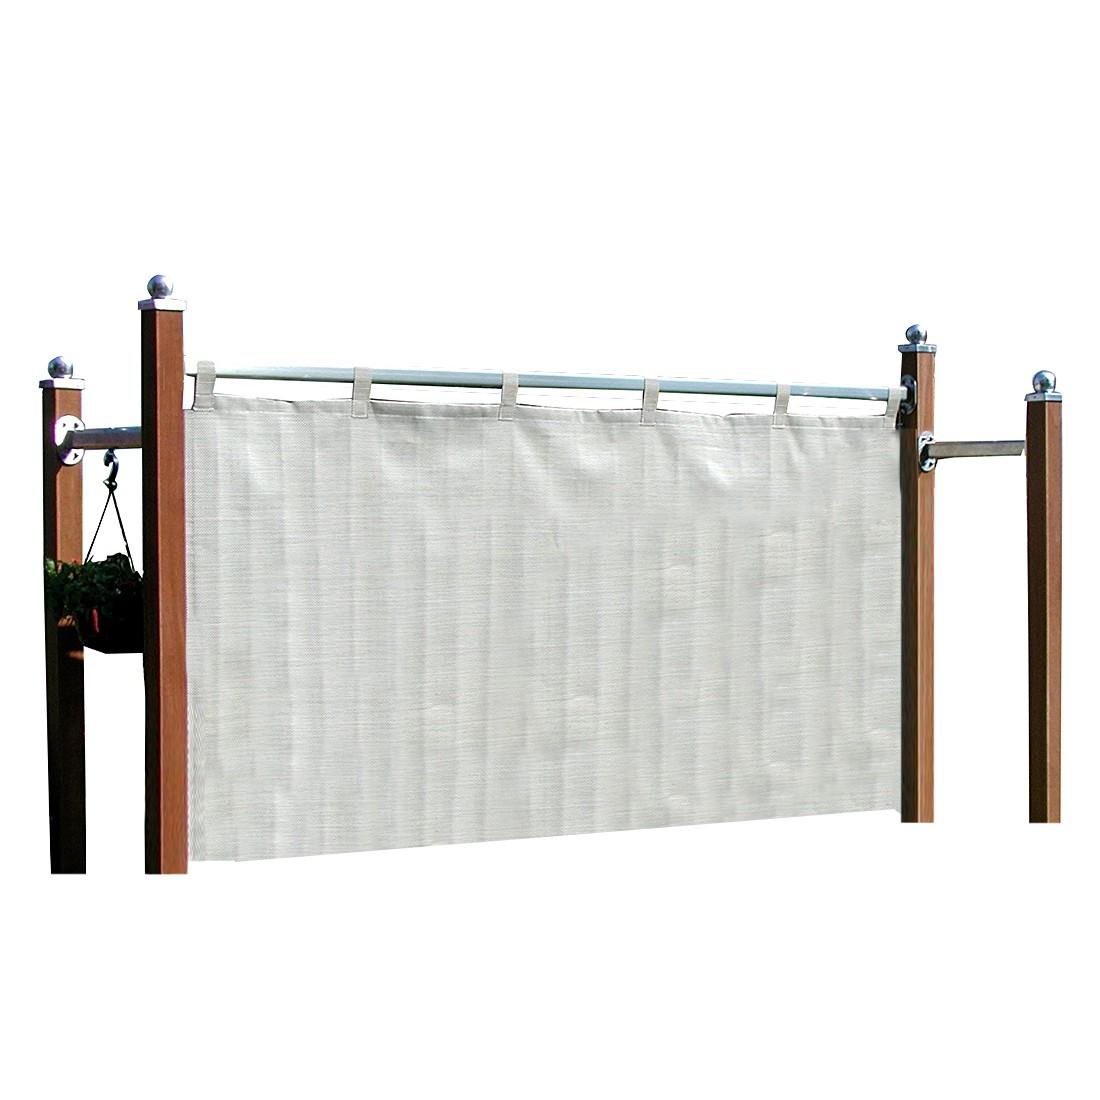 Sicht- und Windschutz Royal - Eukalyptus massiv/Kunststoff - Grau, Leco